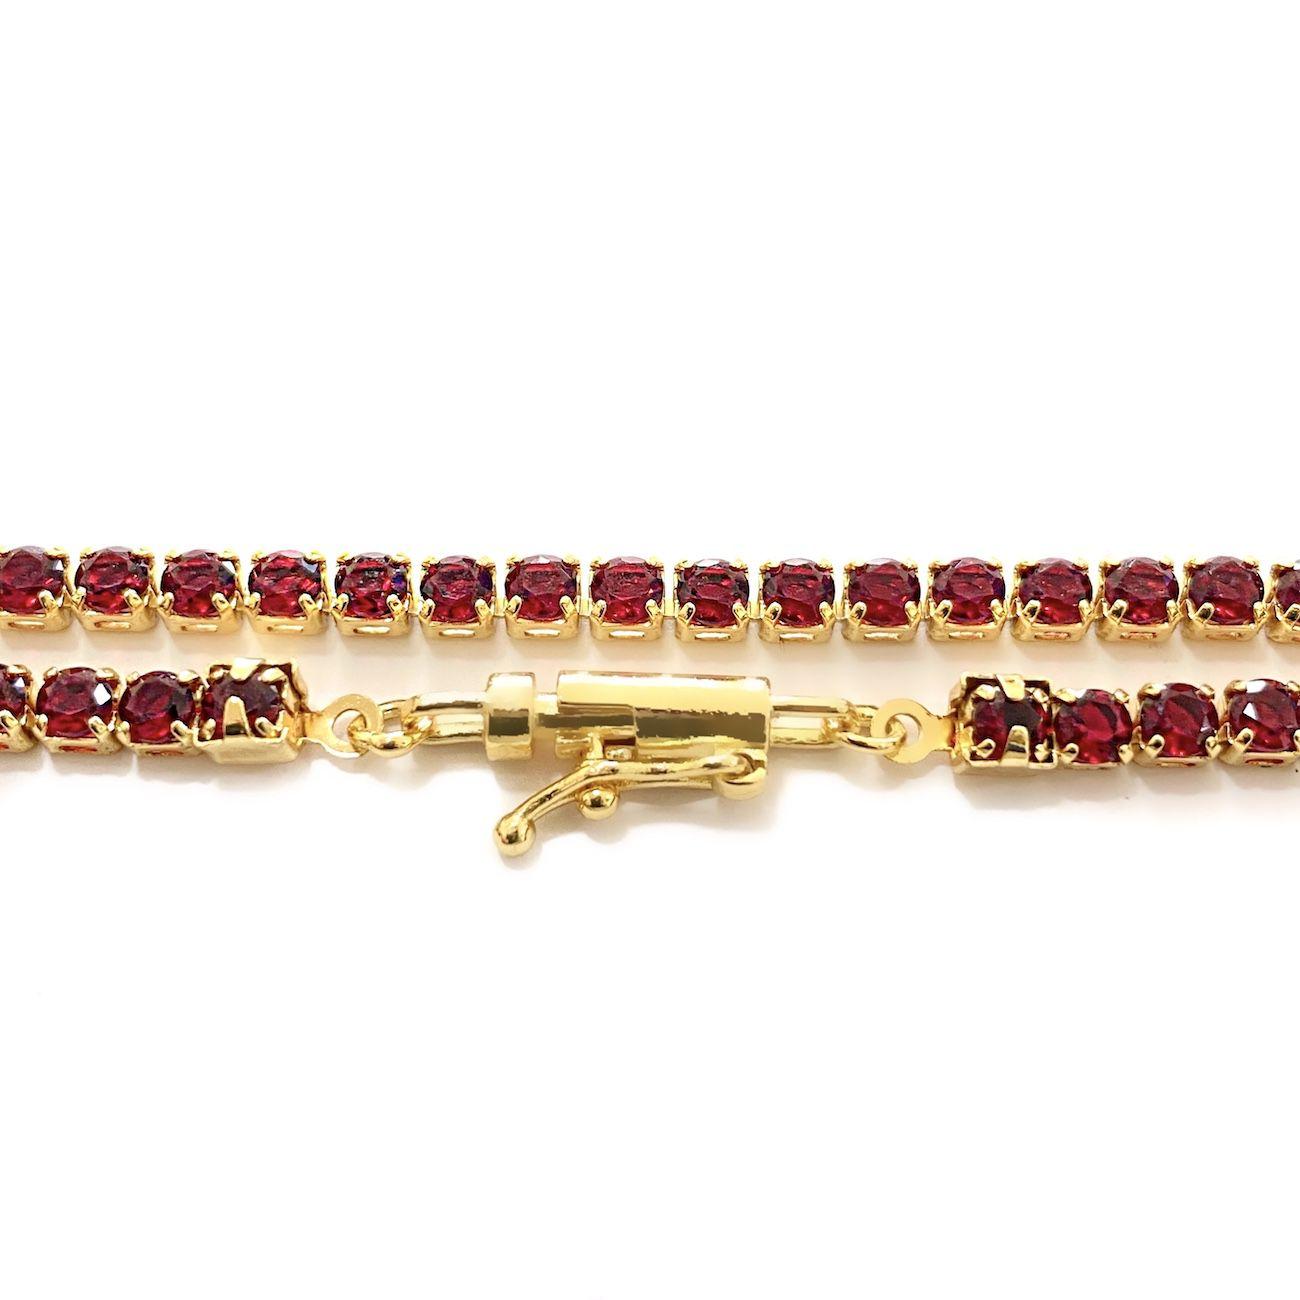 Corrente Riviera Tennis Chain 3mm 60cm 14g (Pedra Zircônia Vermelha) (Banho Ouro 18k)